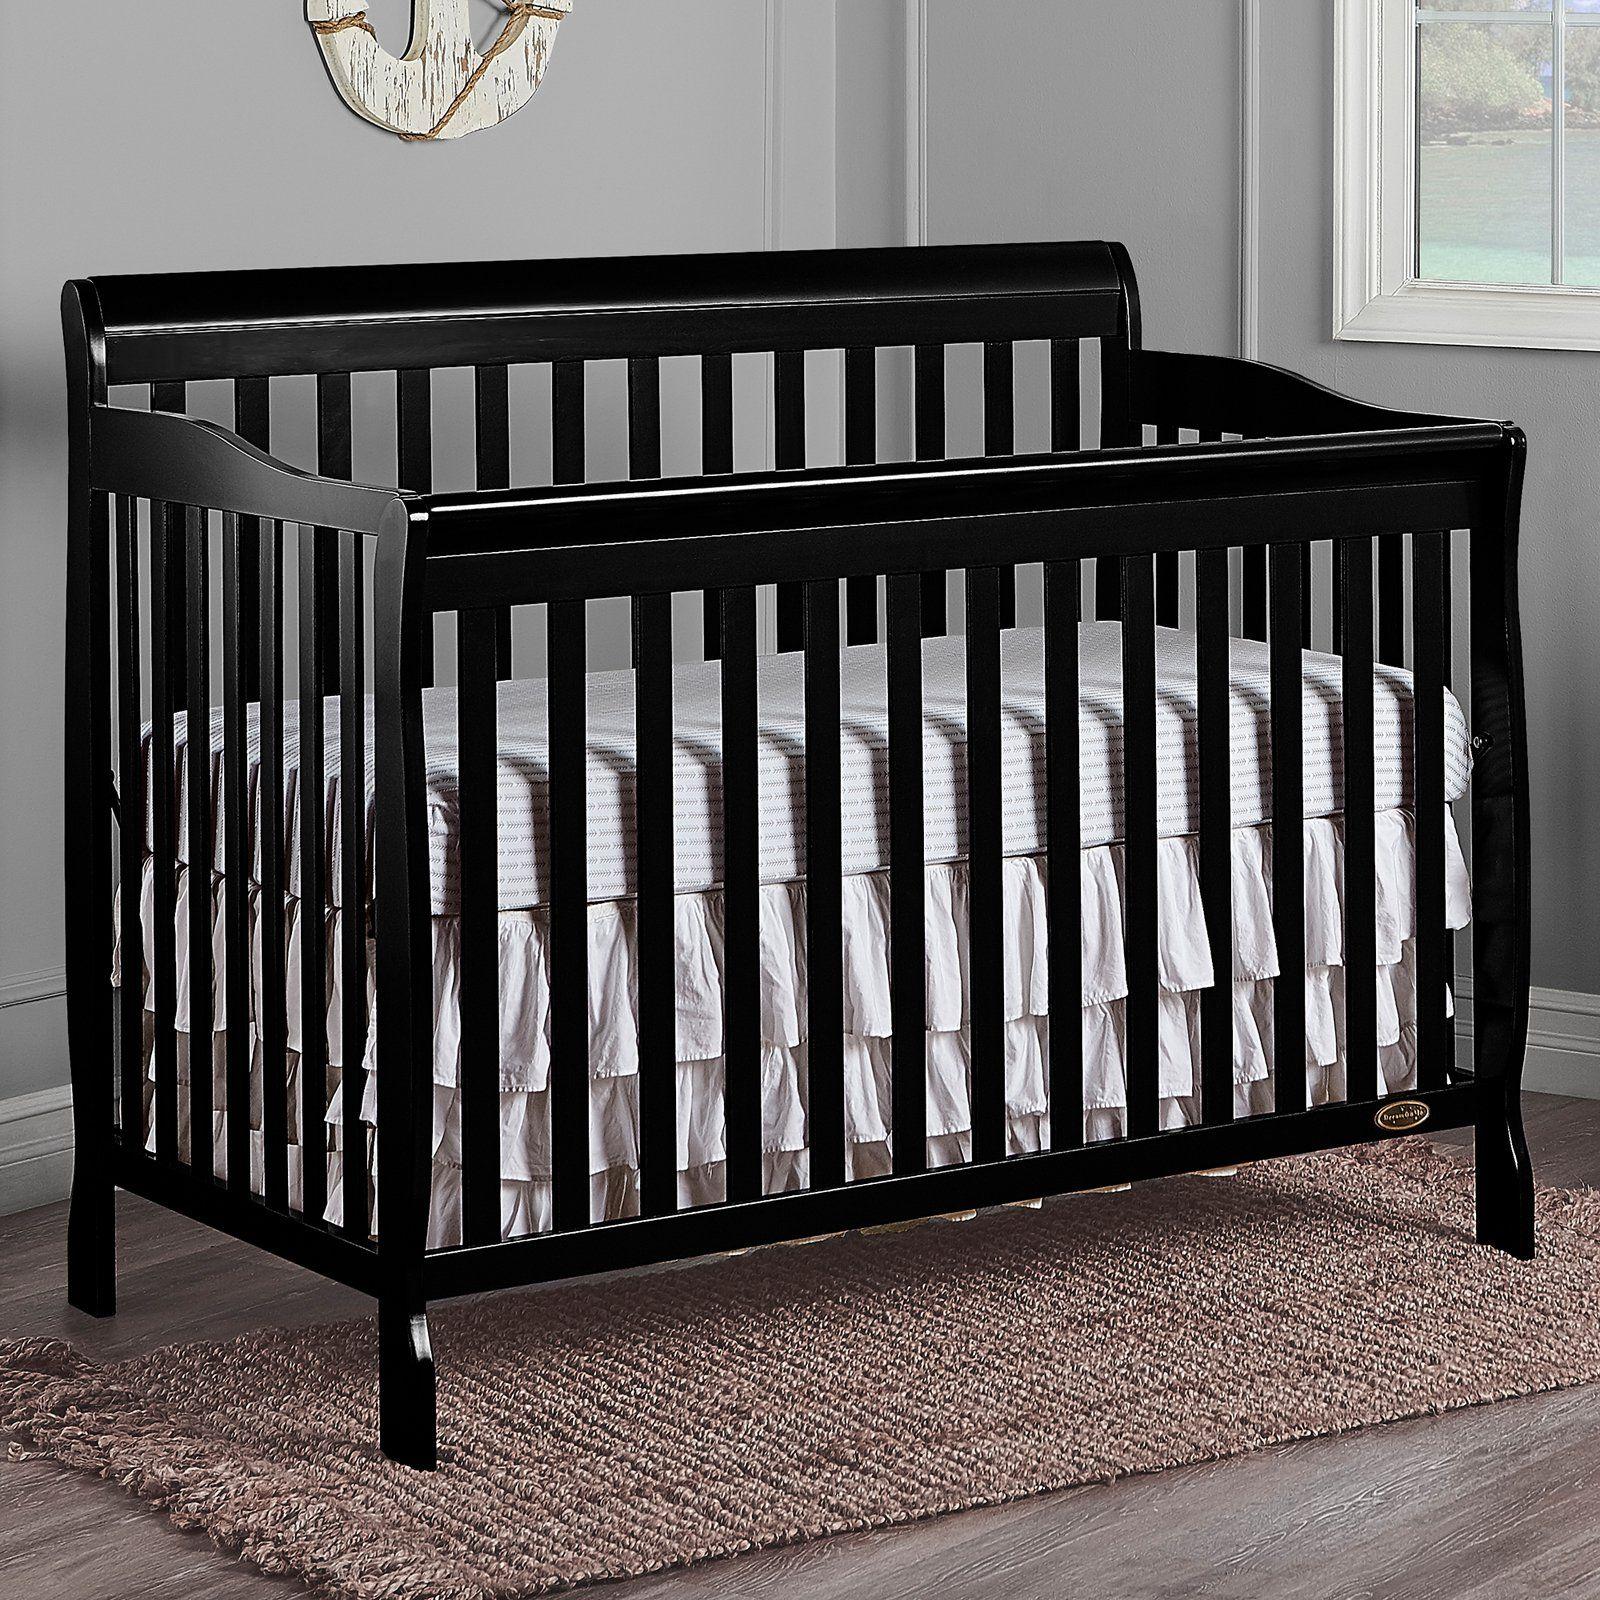 Dream On Me Ashton 5 In 1 Convertible Crib Convertible Crib Cribs Mattress Furniture